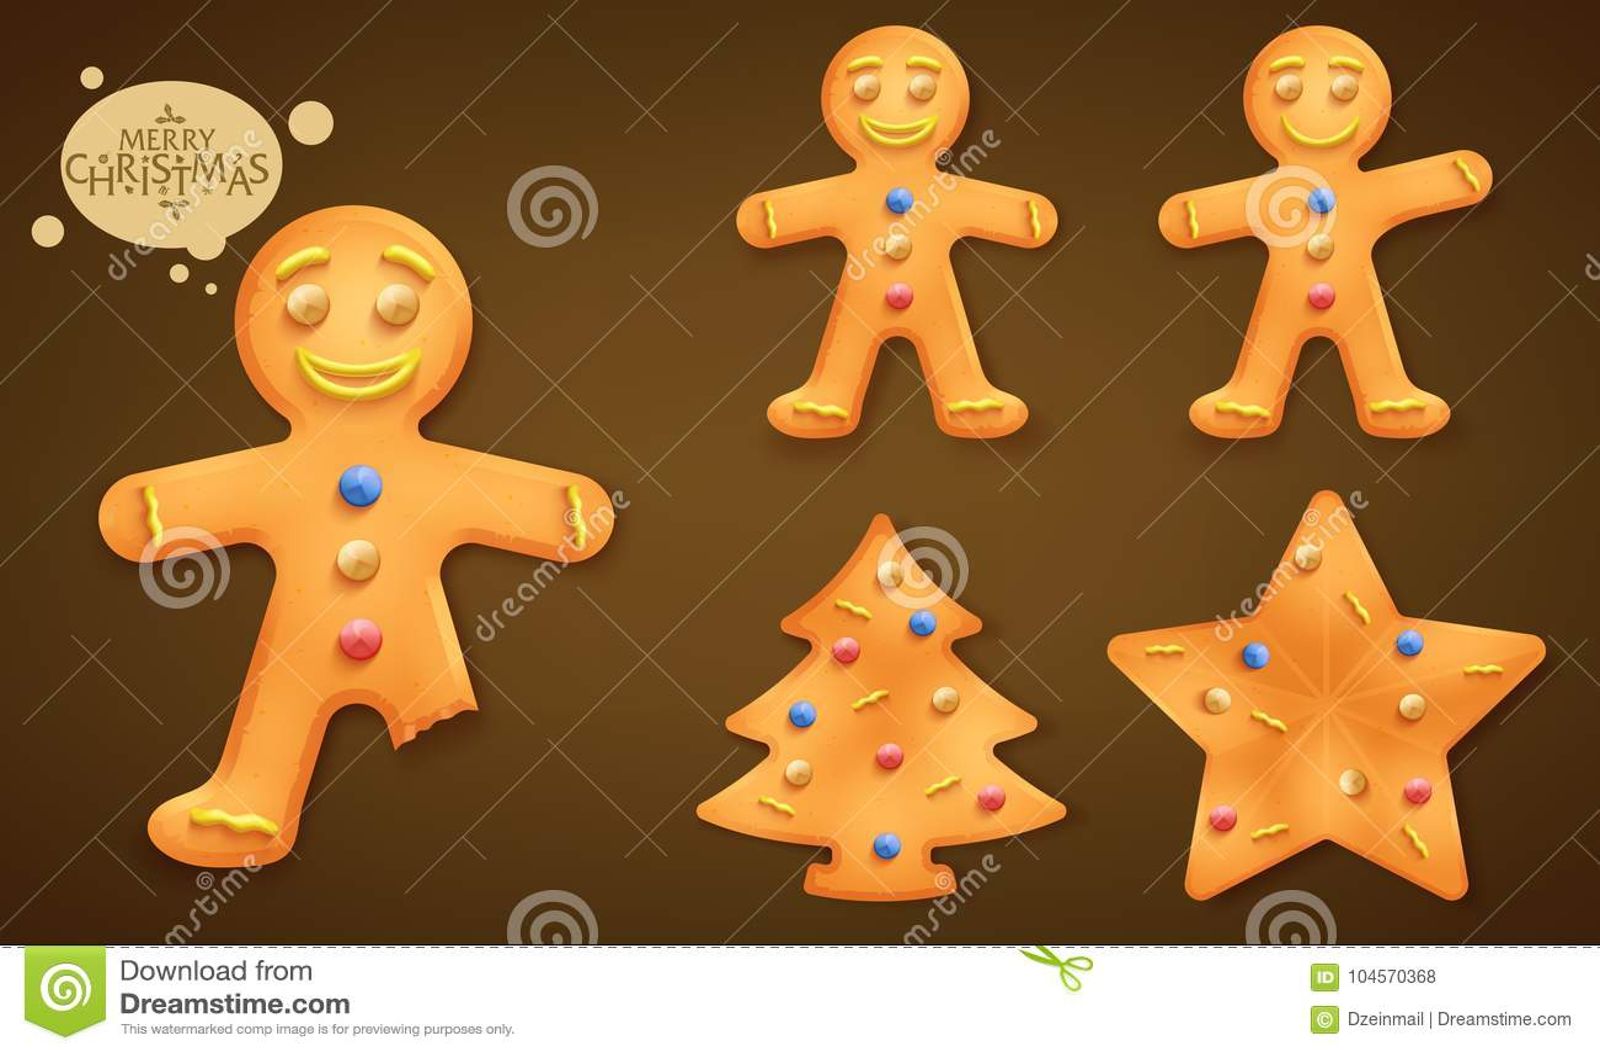 Biscotti Albero Di Natale 3d.Uomo Di Pan Di Zenzero Di 3d Brown Albero Di Natale E Biscotti